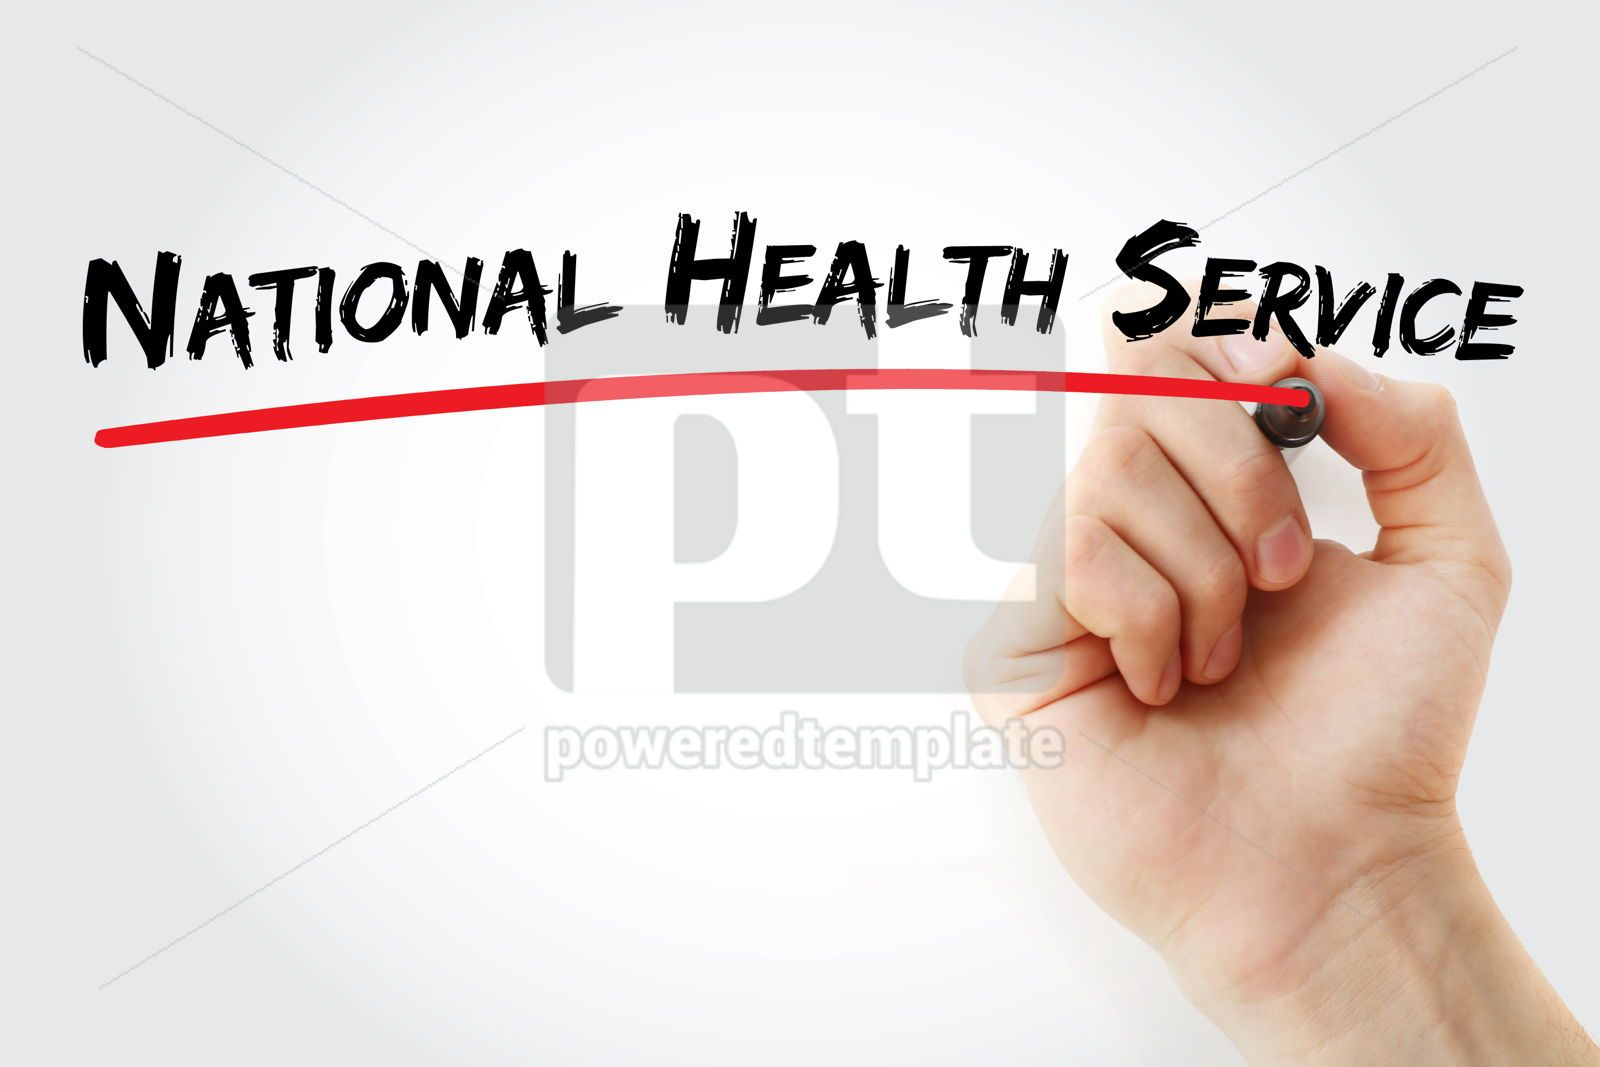 National Health Service text medical concept background, 17070, Business — PoweredTemplate.com